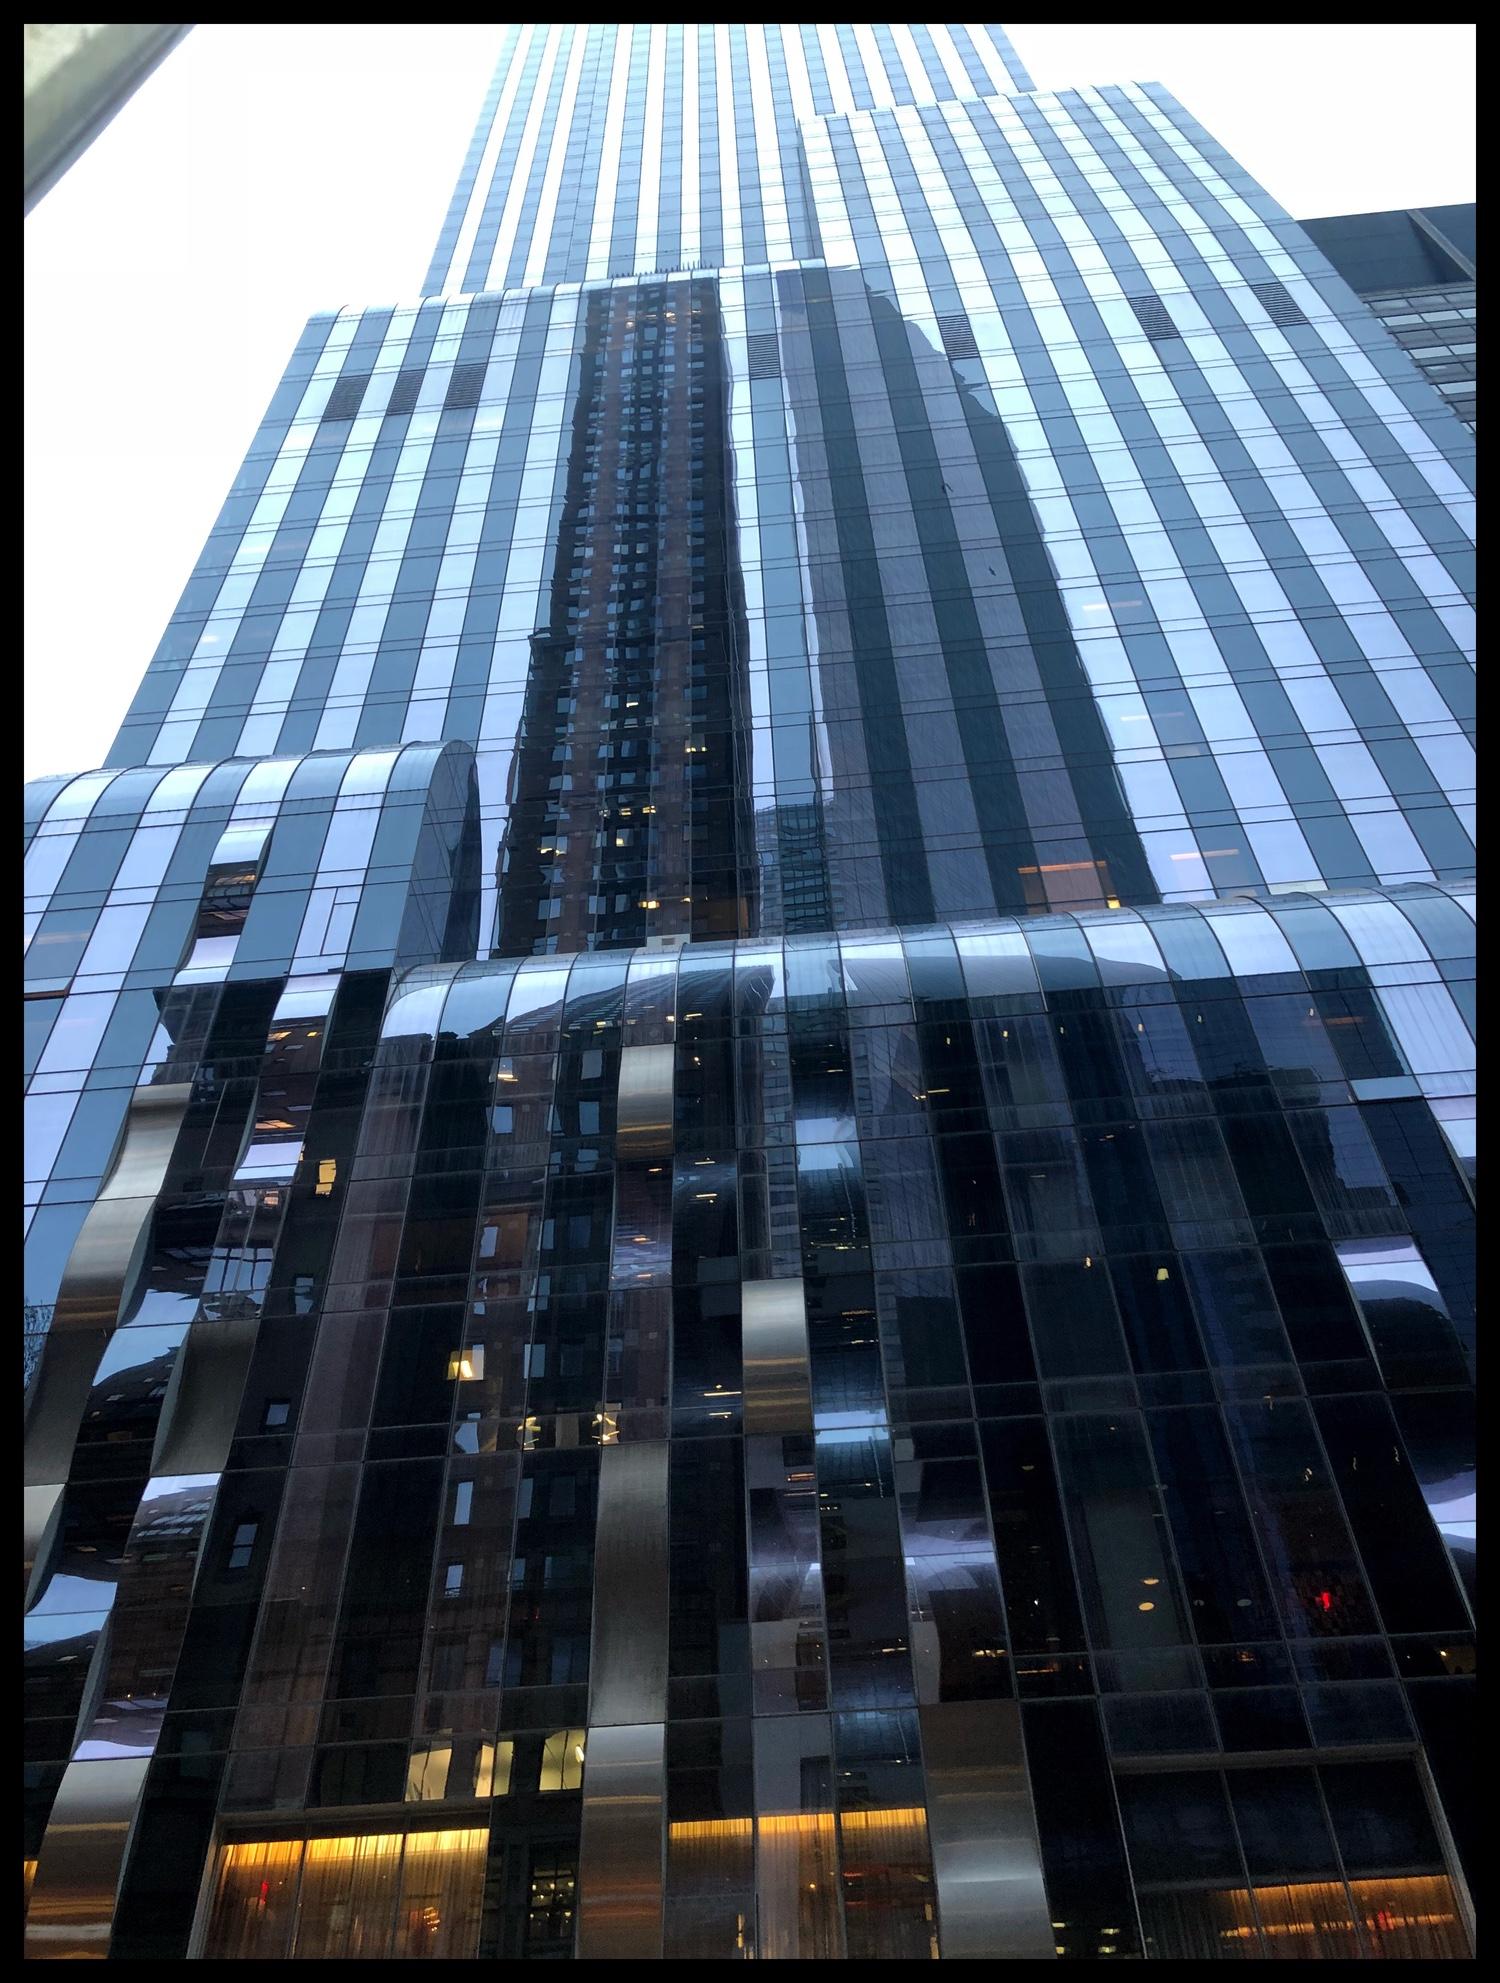 Park Hyatt, NYC - 57th St & 7th Ave